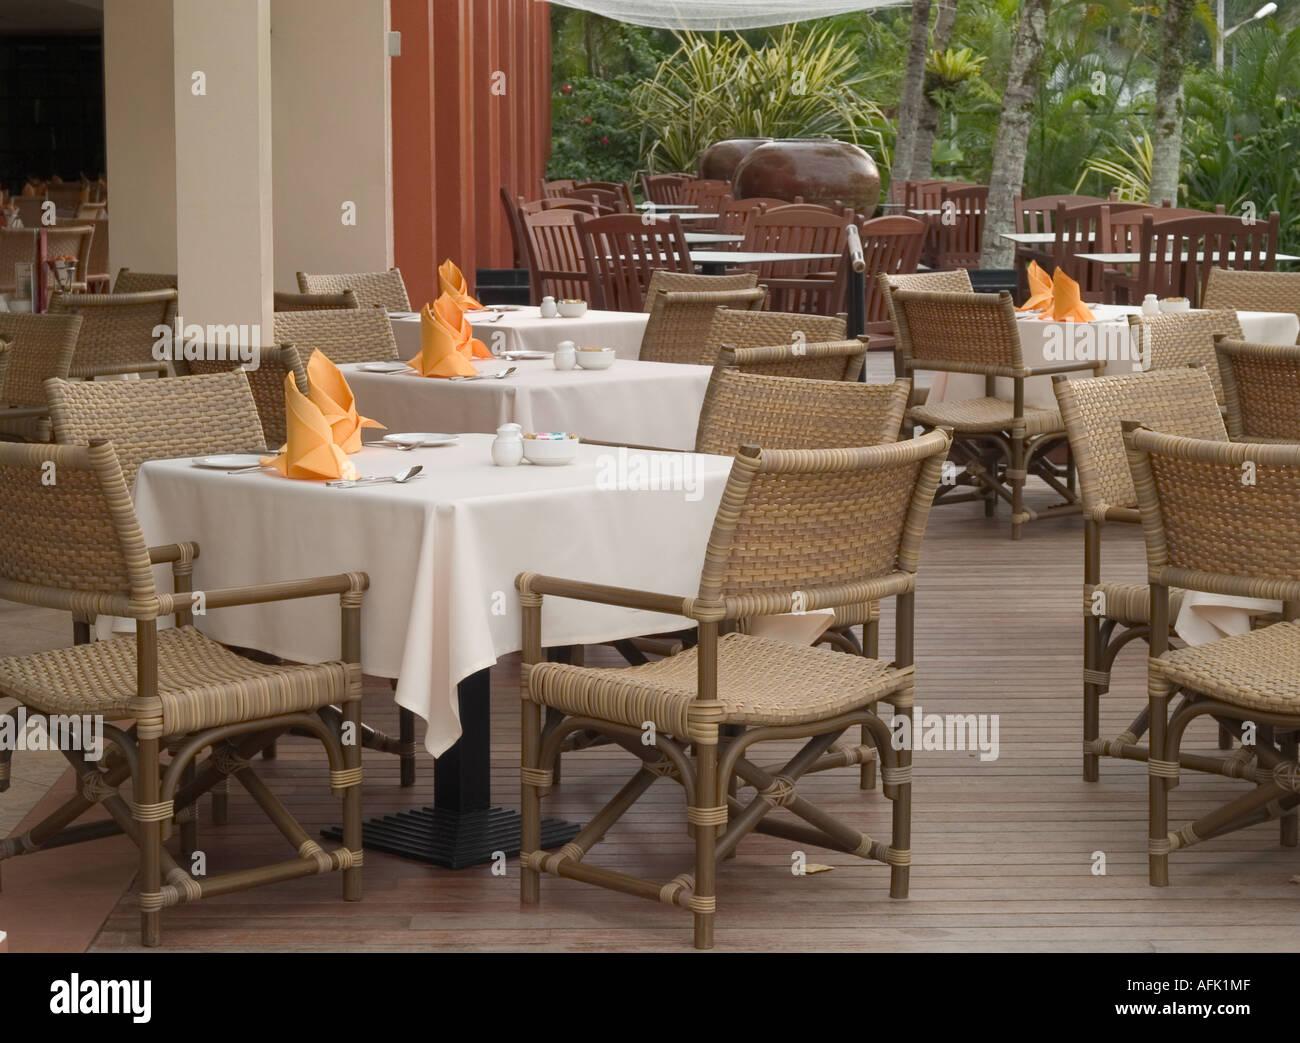 Hotel Restaurant Tables Stock Photos & Hotel Restaurant Tables Stock ...